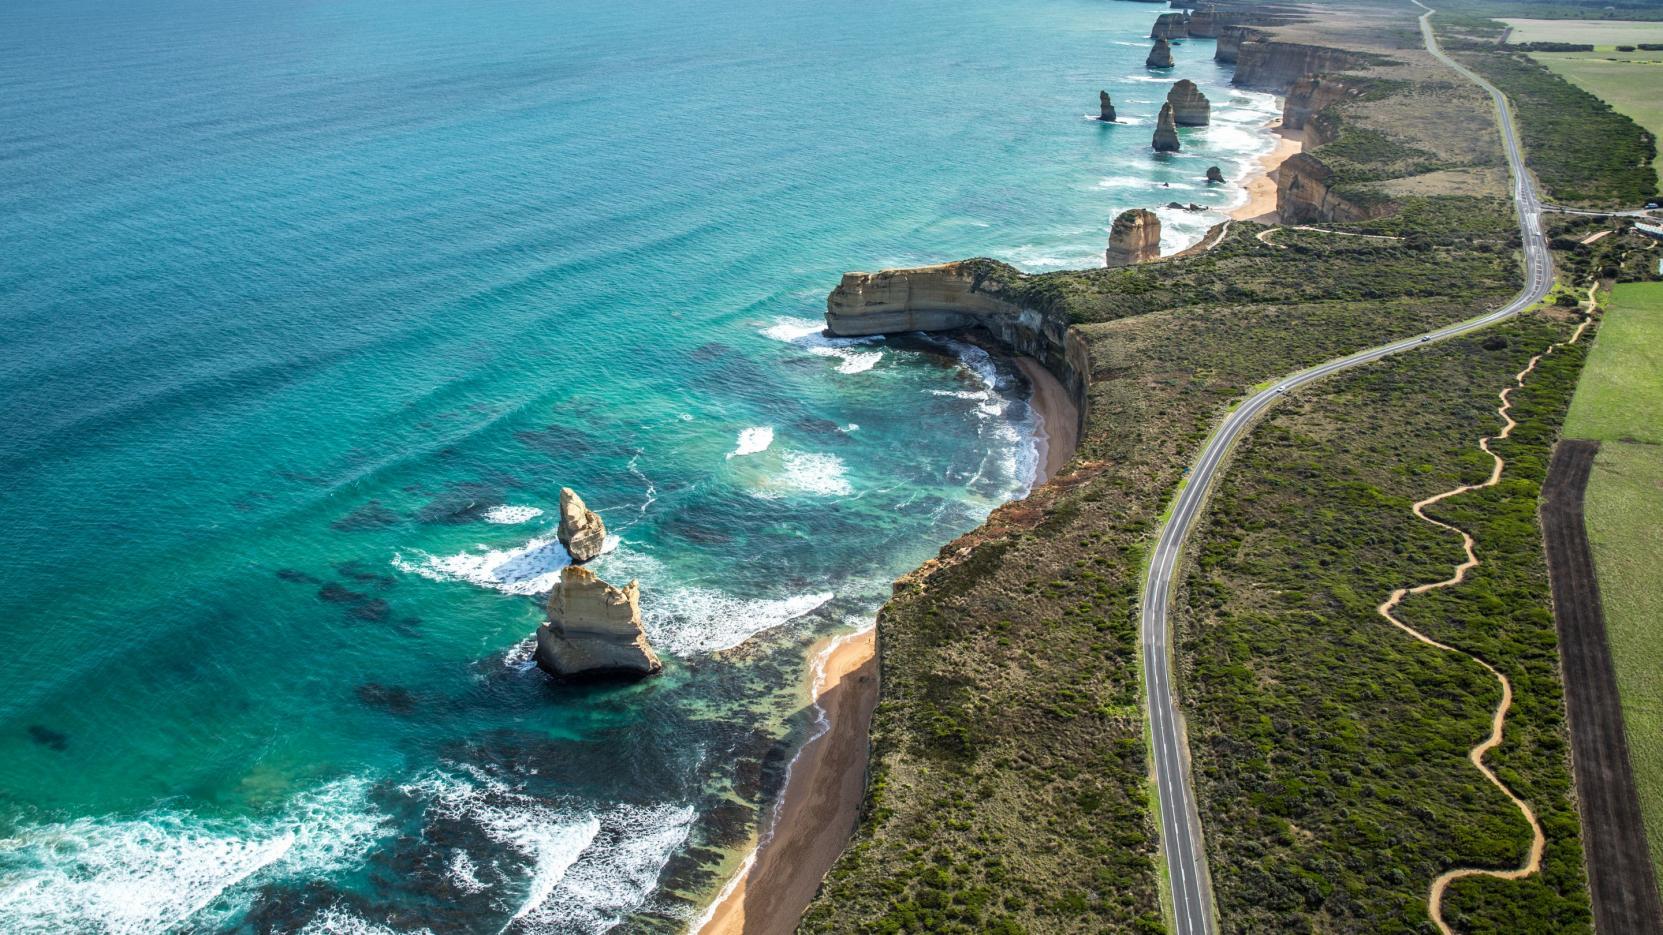 Ba tuần du lịch trải nghiệm từ Melbourne